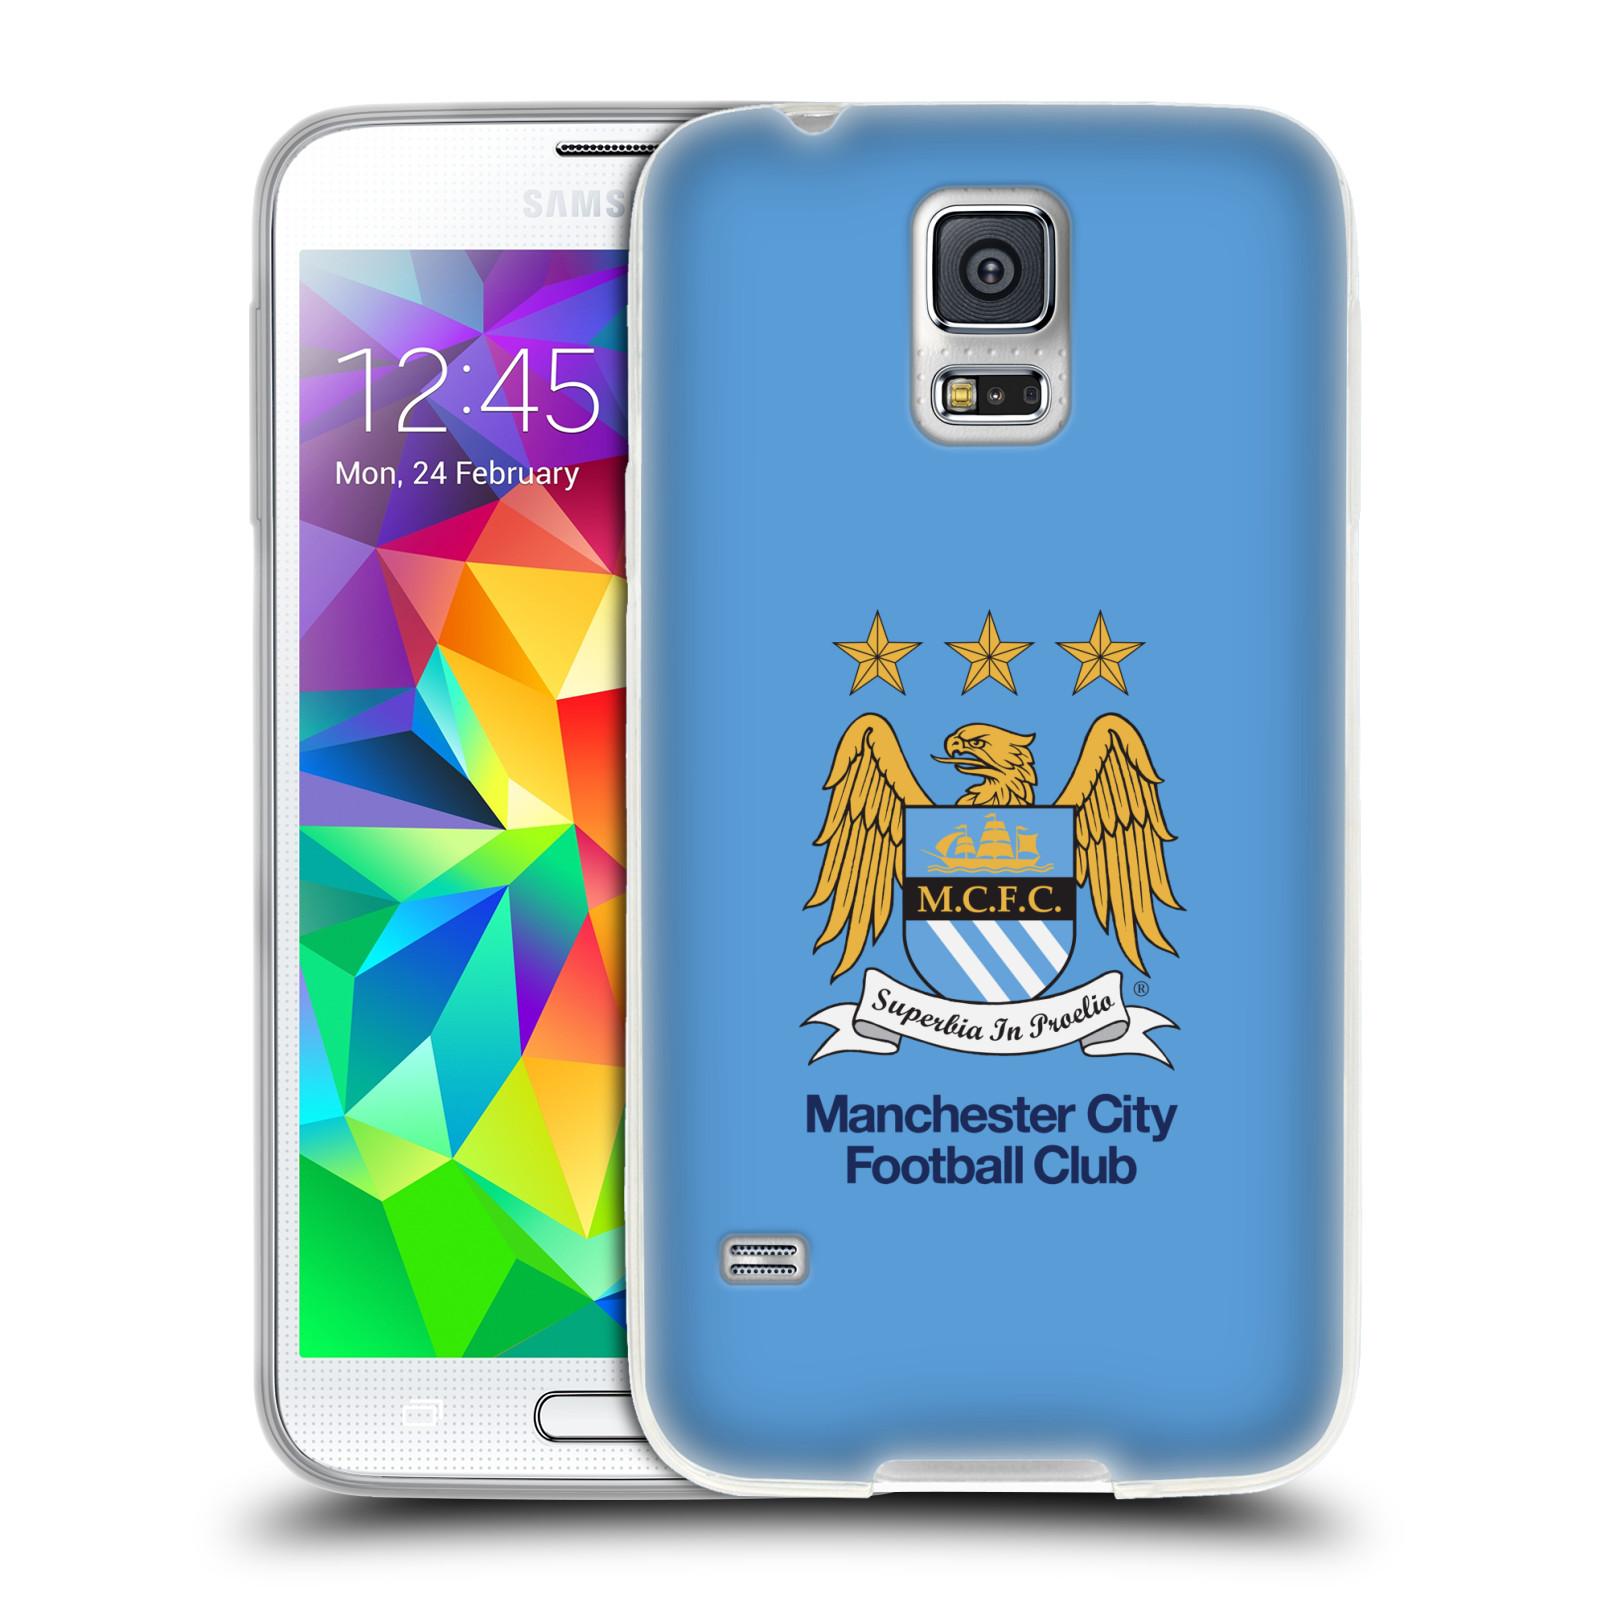 HEAD CASE silikonový obal na mobil Samsung Galaxy S5 Fotbalový klub Manchester City nebesky modrá pozadí velký znak pták